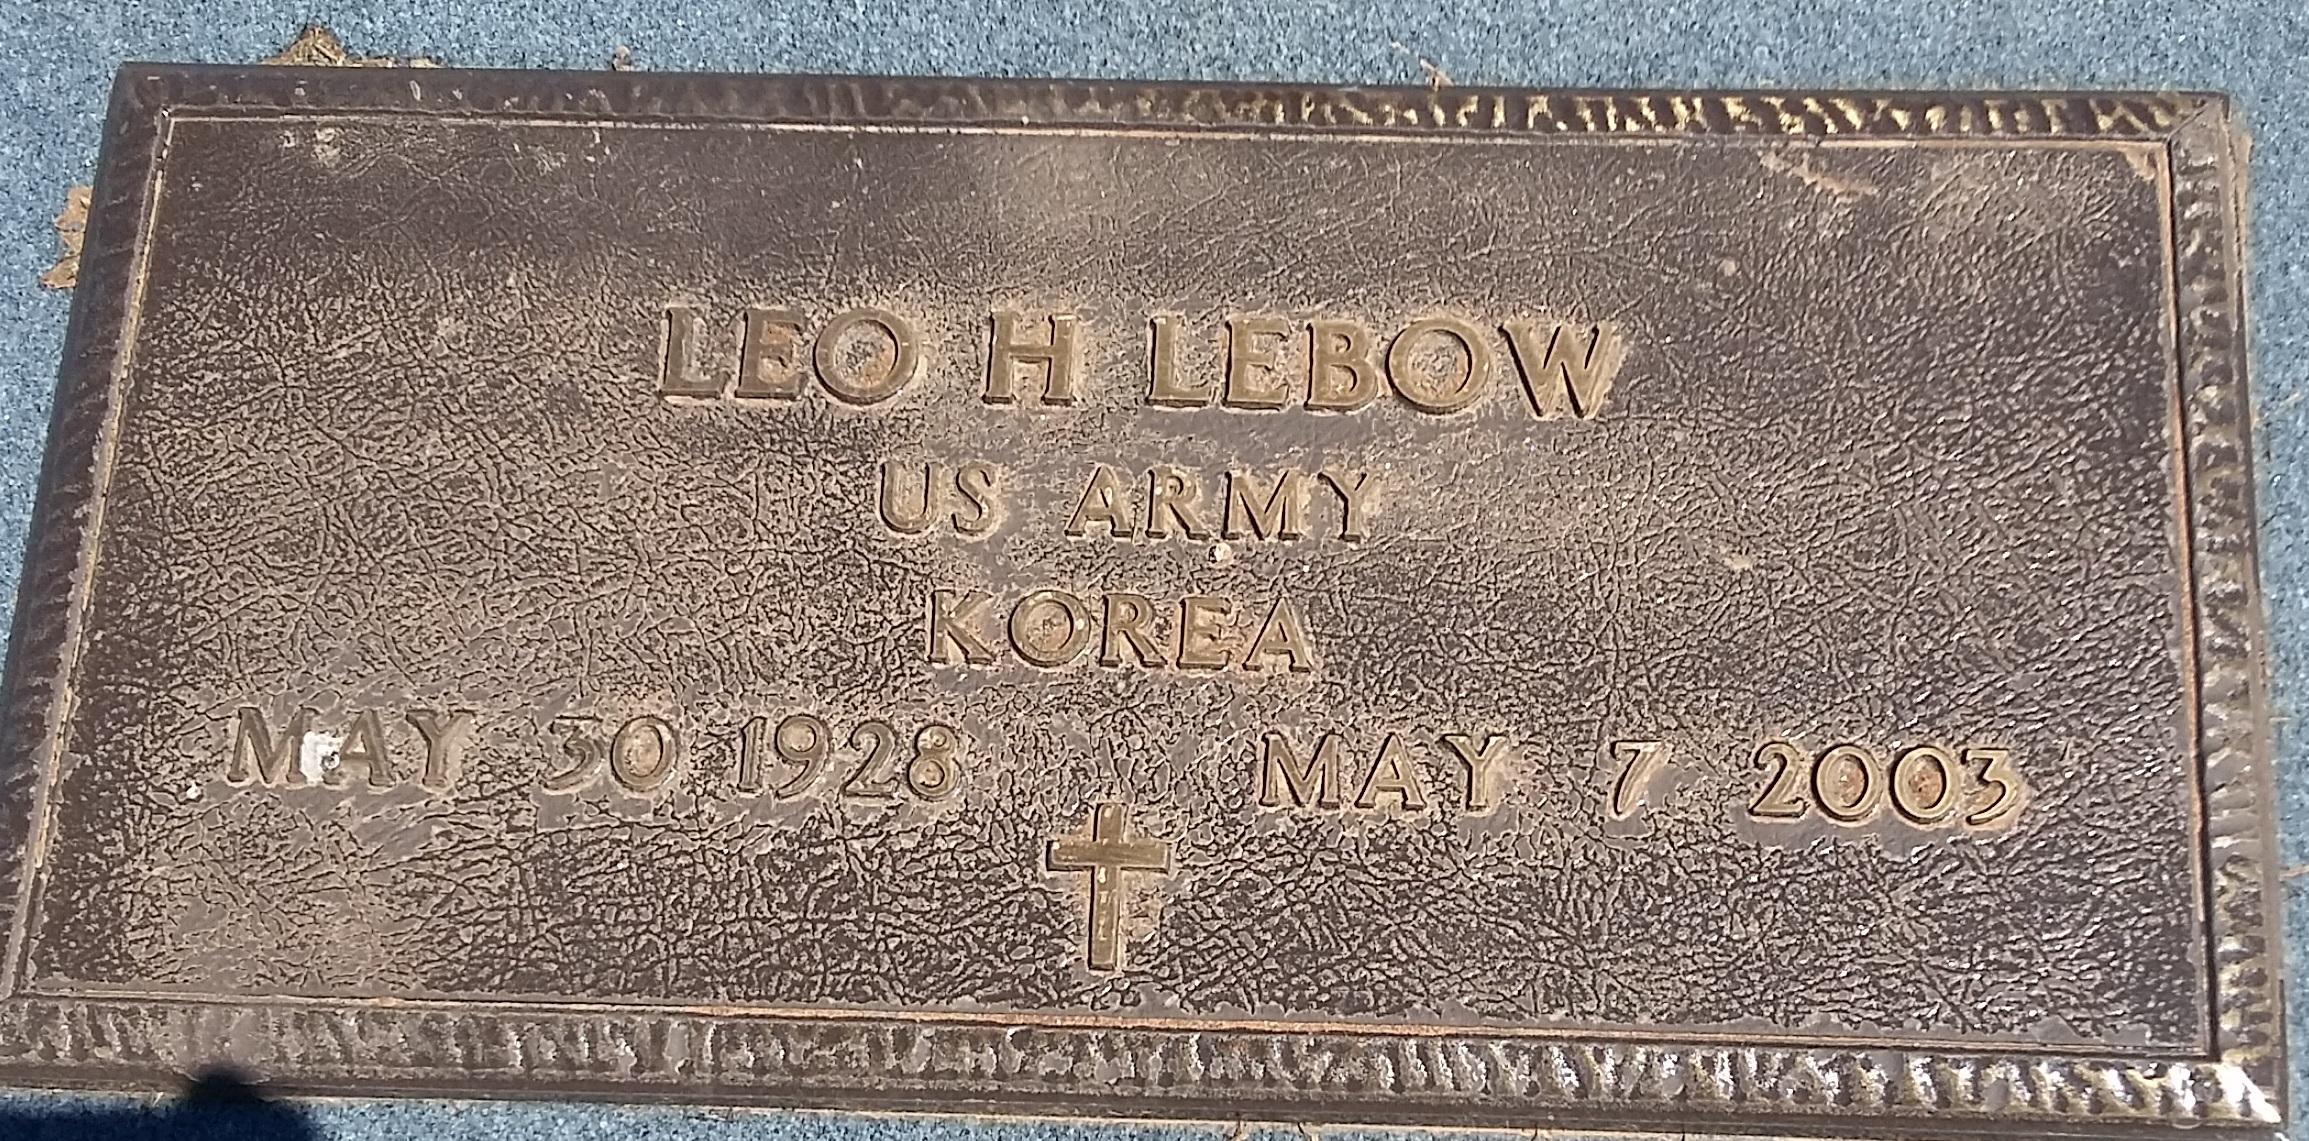 Leo Houston Lebow